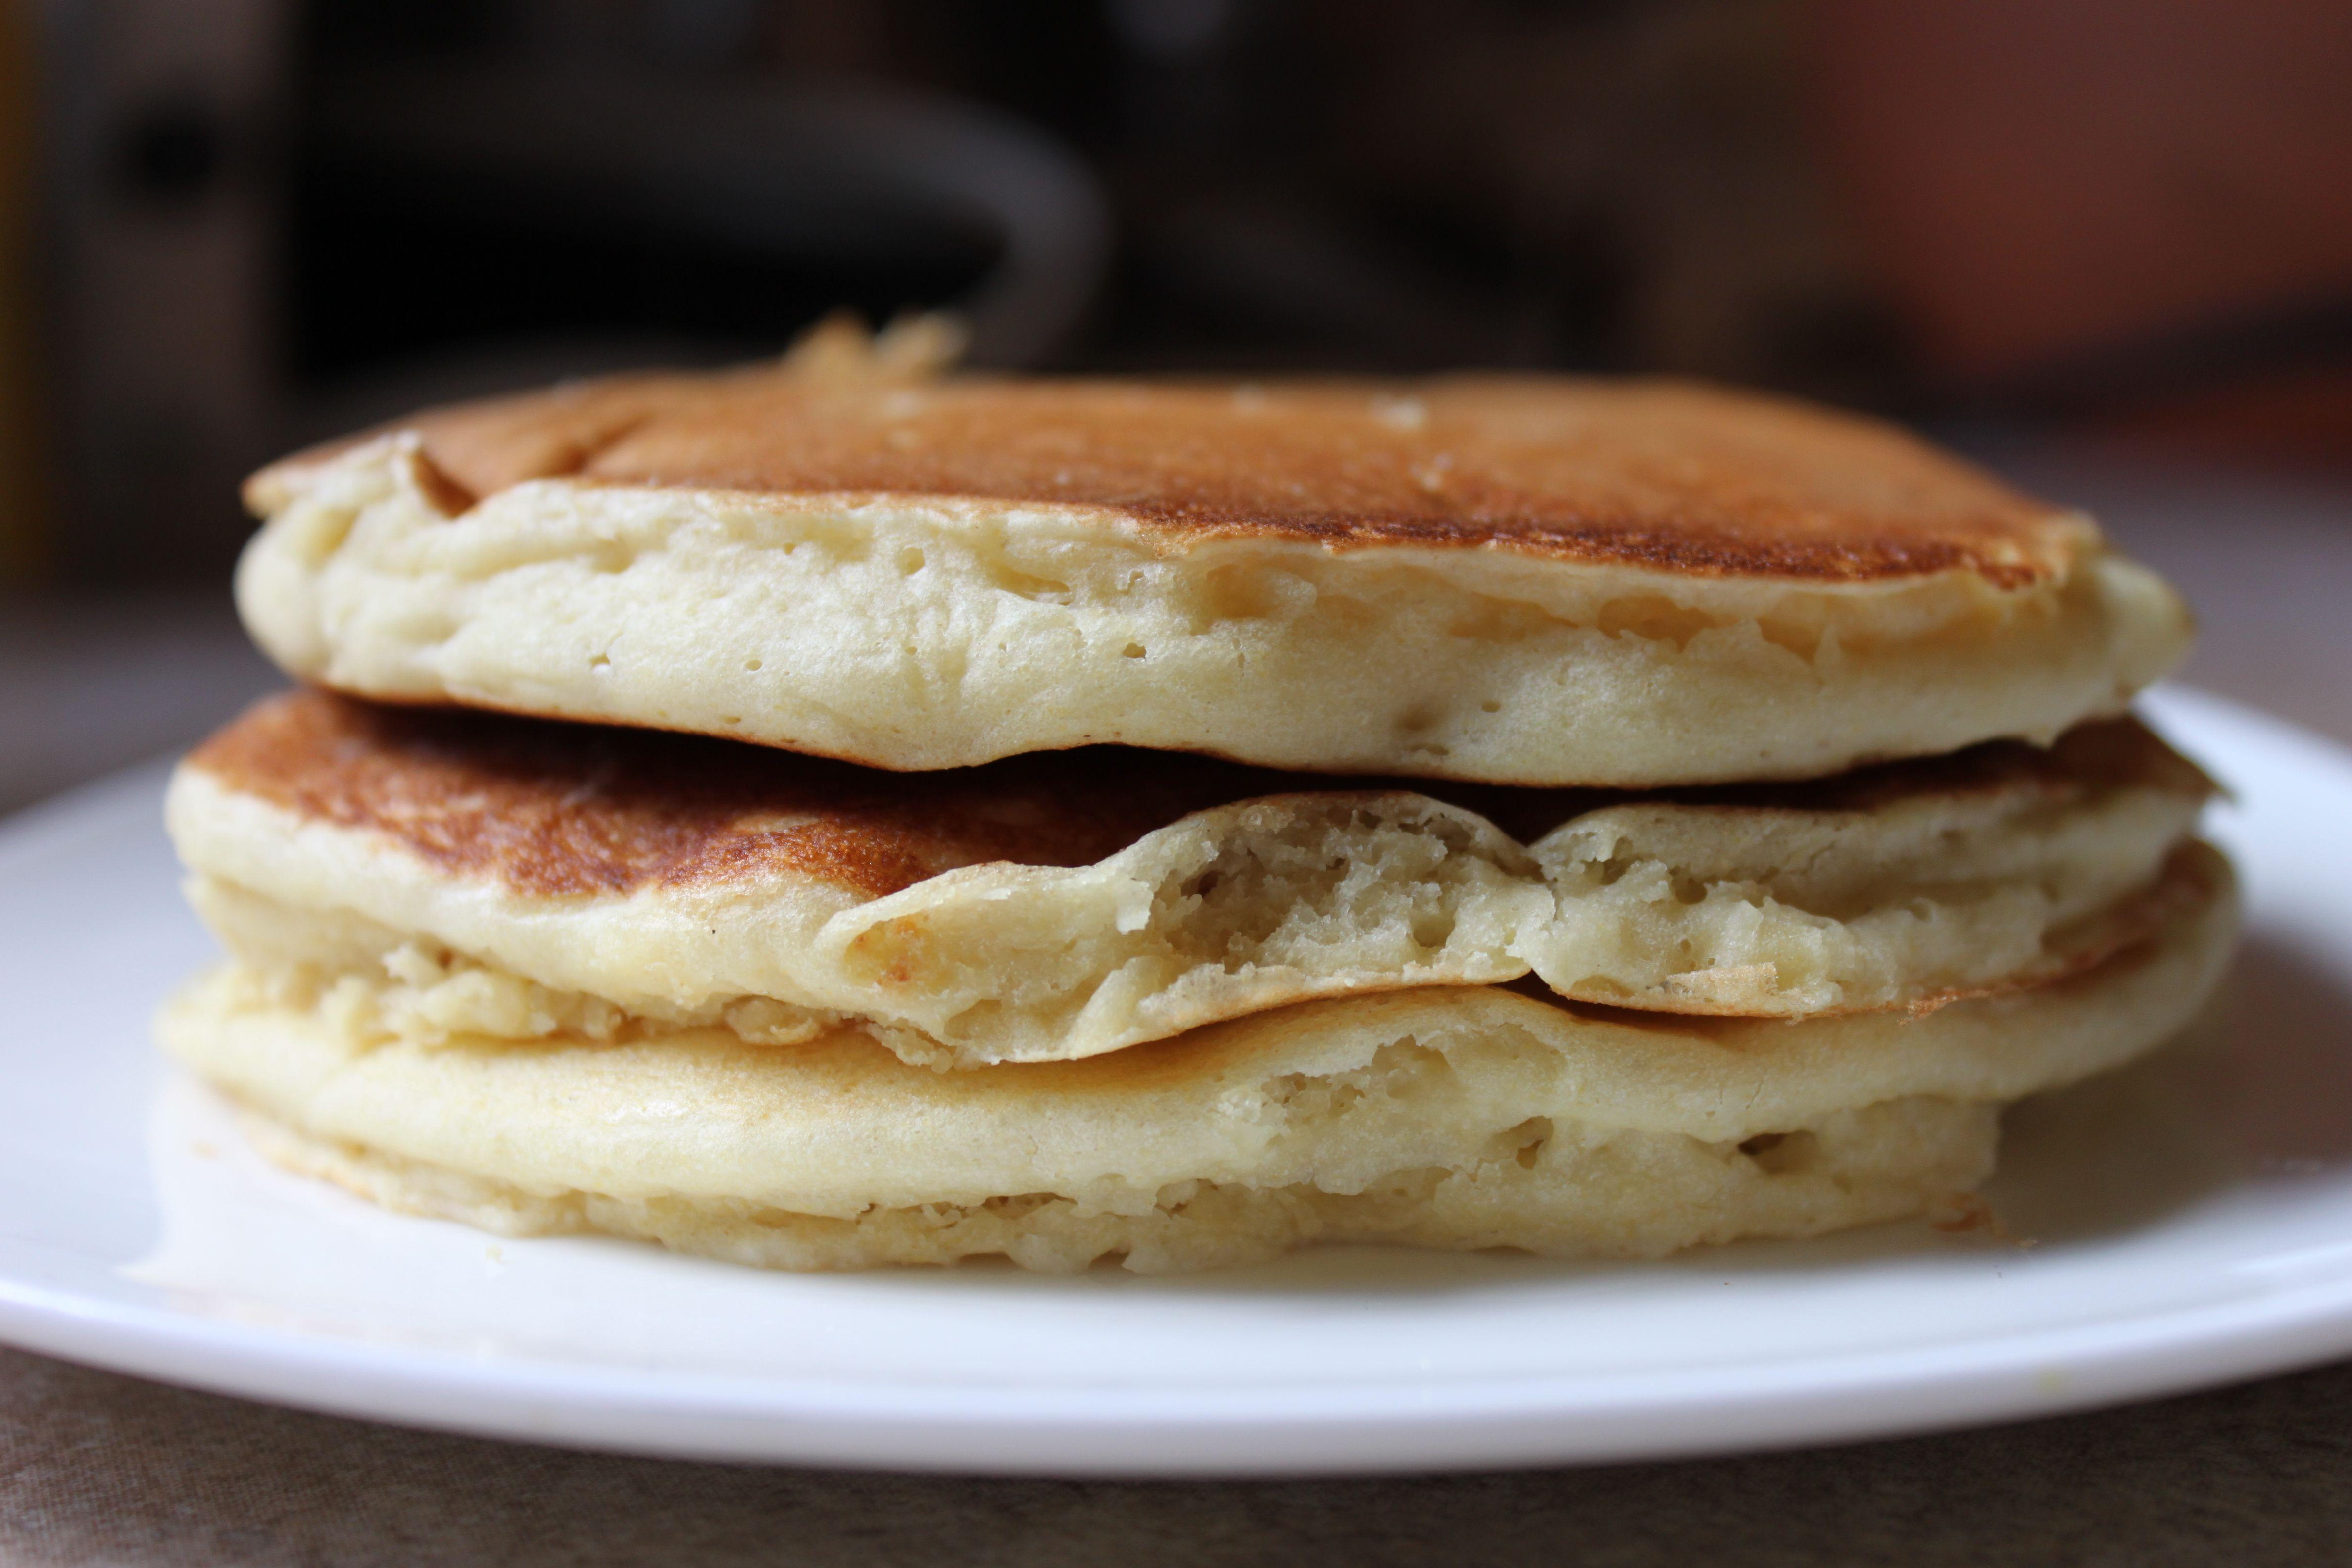 How to make fluffy vegan pancakes using aunt jemimas mix